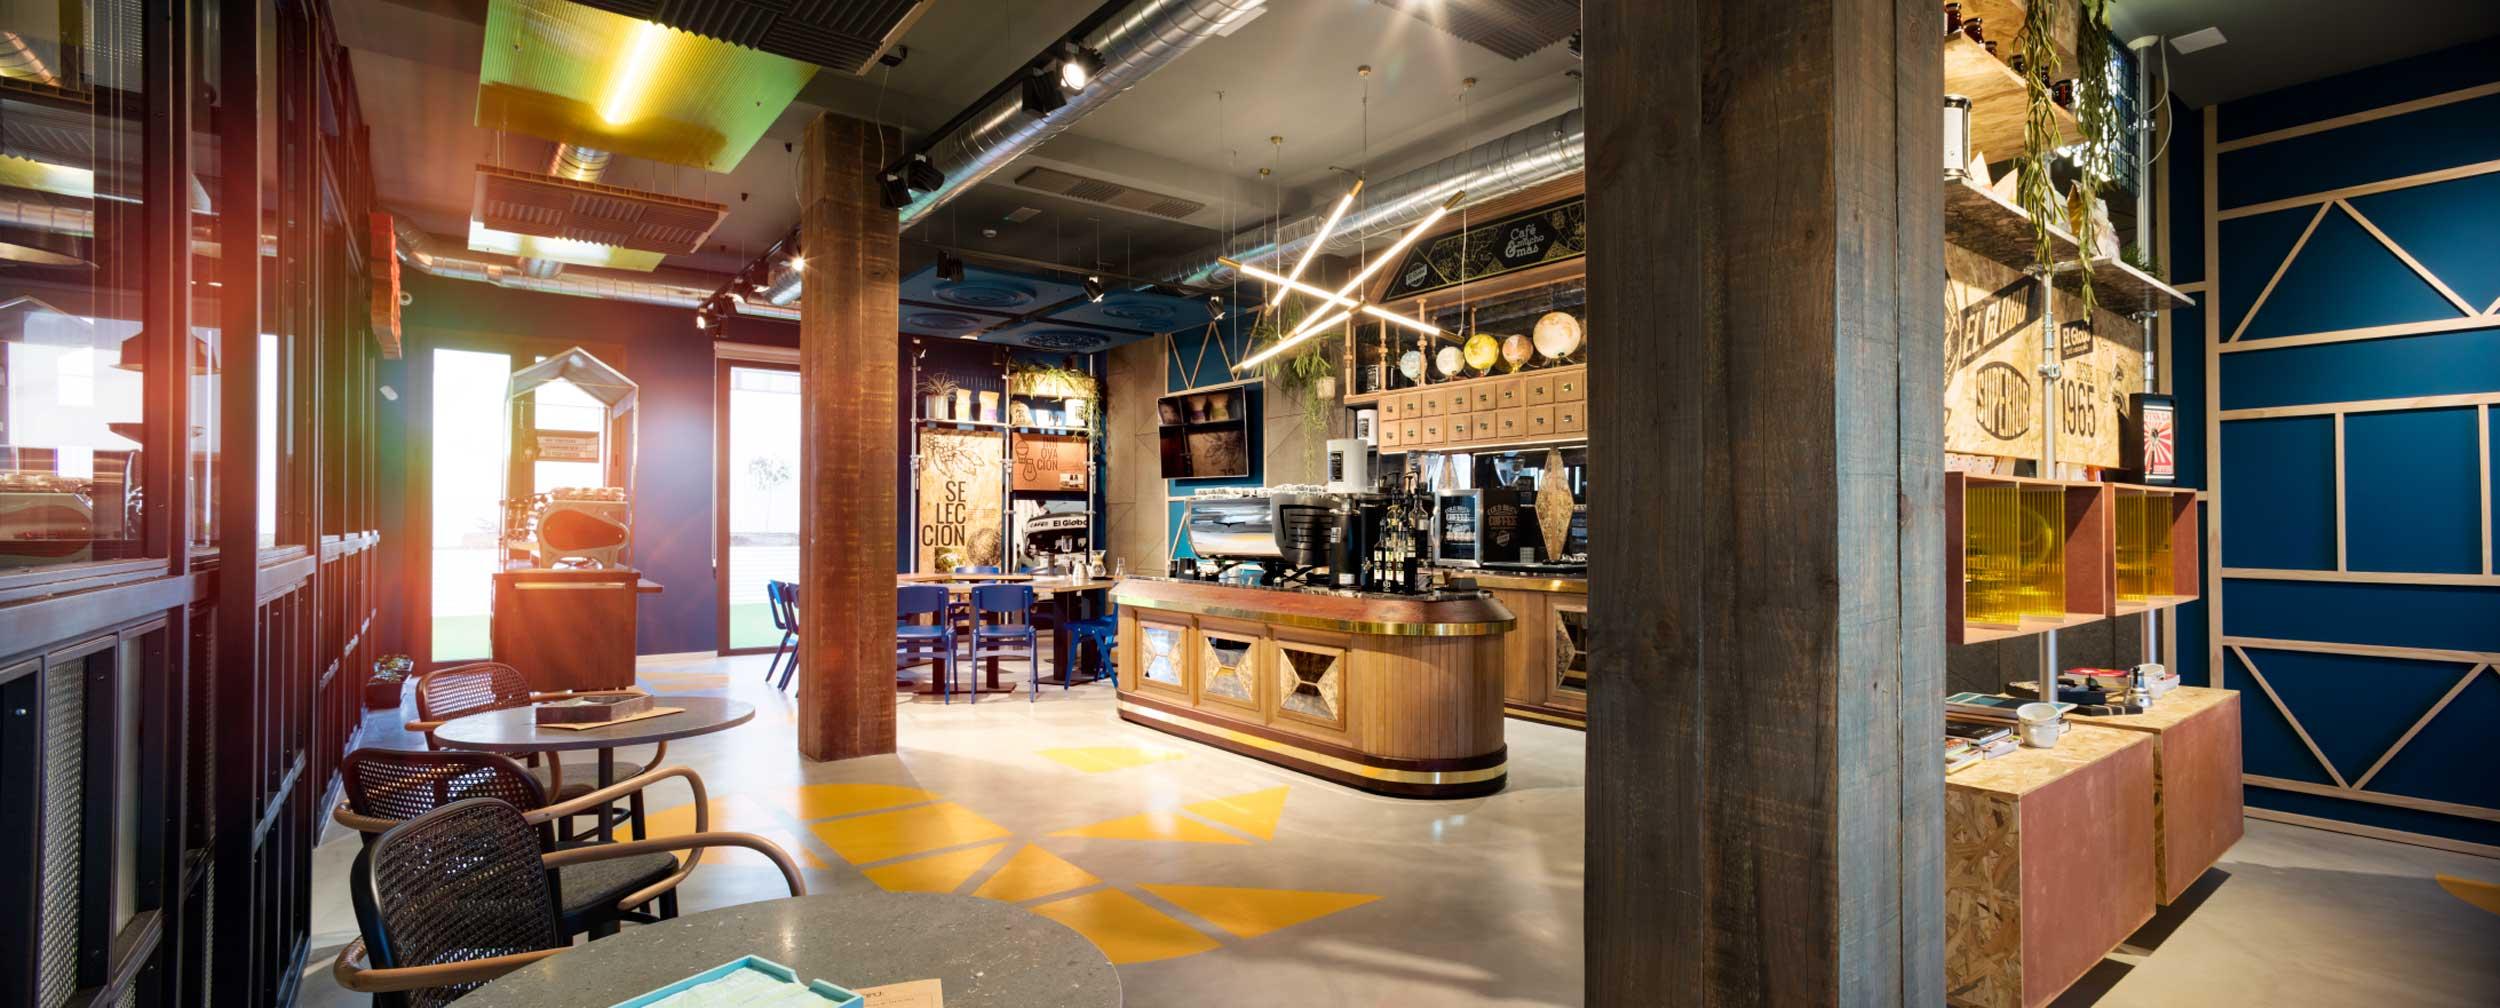 Cafés el Globo. Interiorismo. Tasting Zone